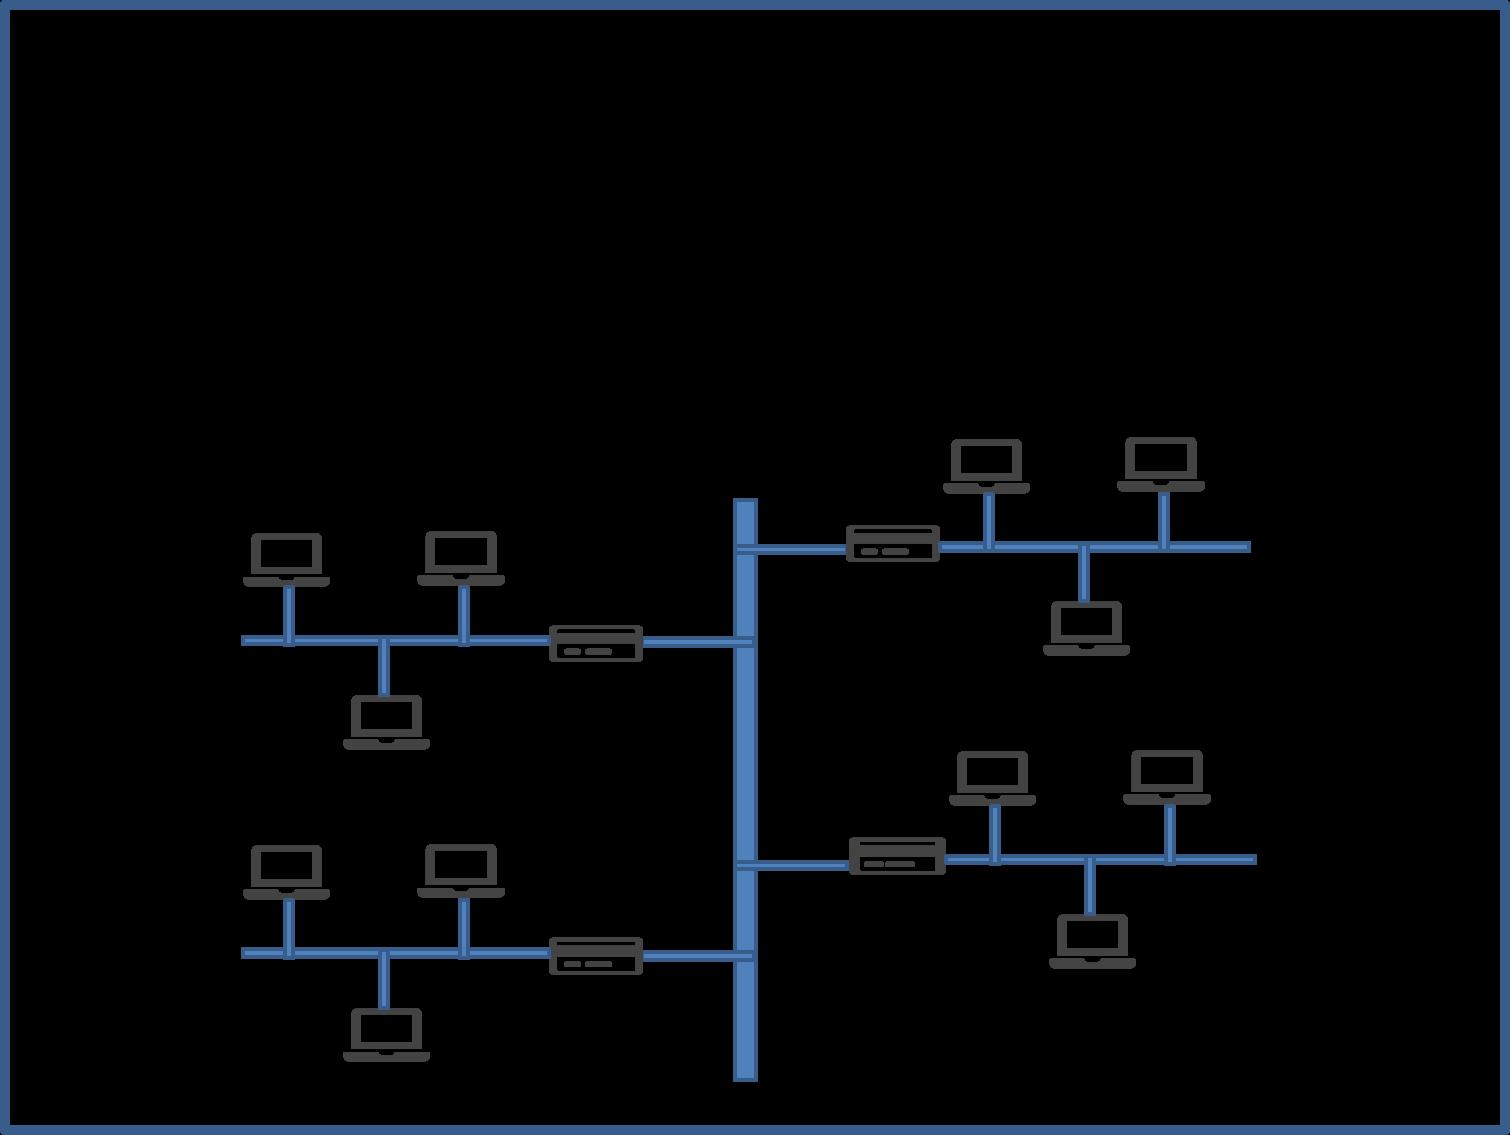 topologi tree sahretech